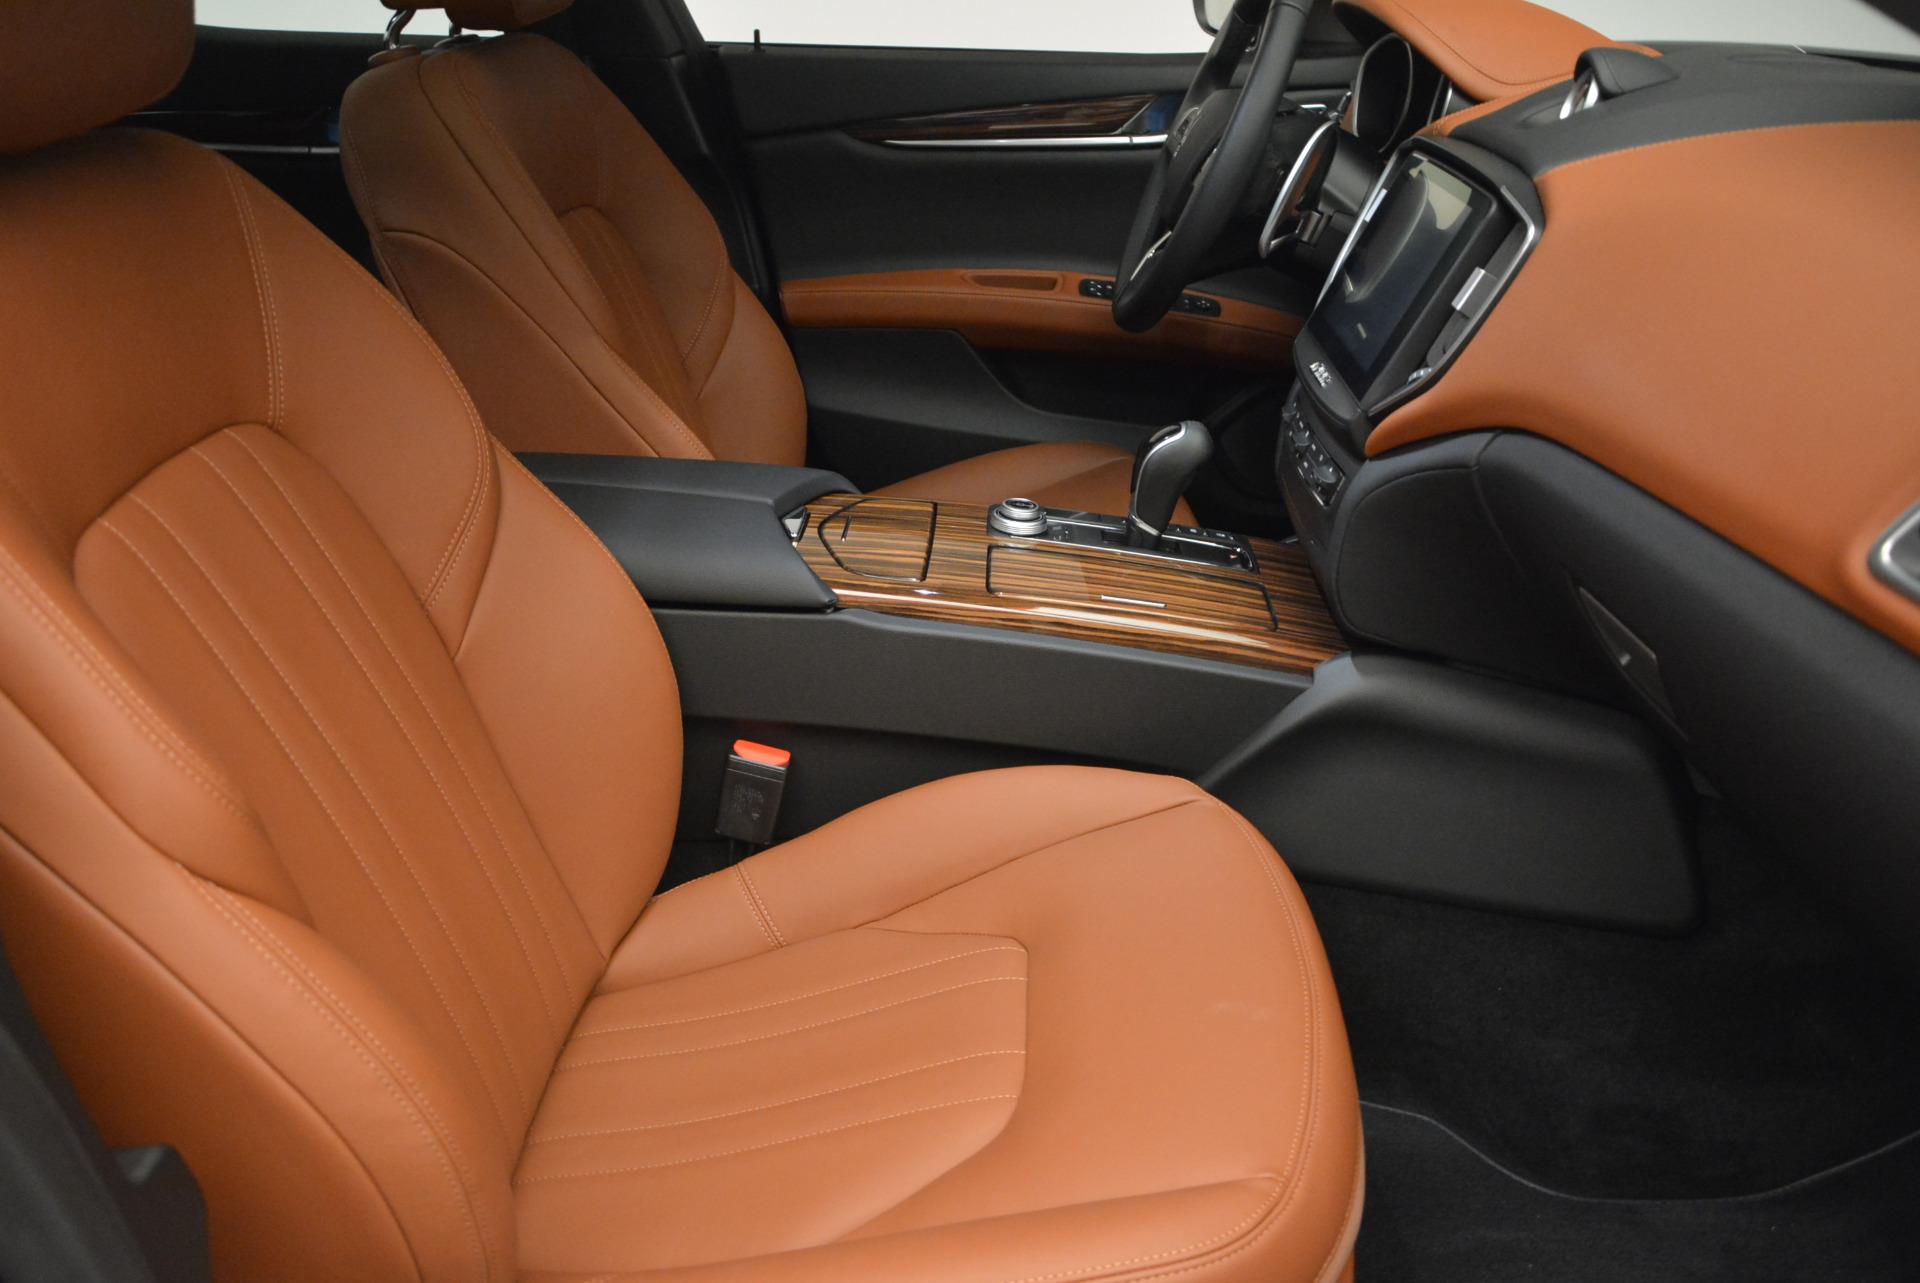 Used 2017 Maserati Ghibli S Q4 - EX Loaner For Sale In Greenwich, CT. Alfa Romeo of Greenwich, M1656 567_p20